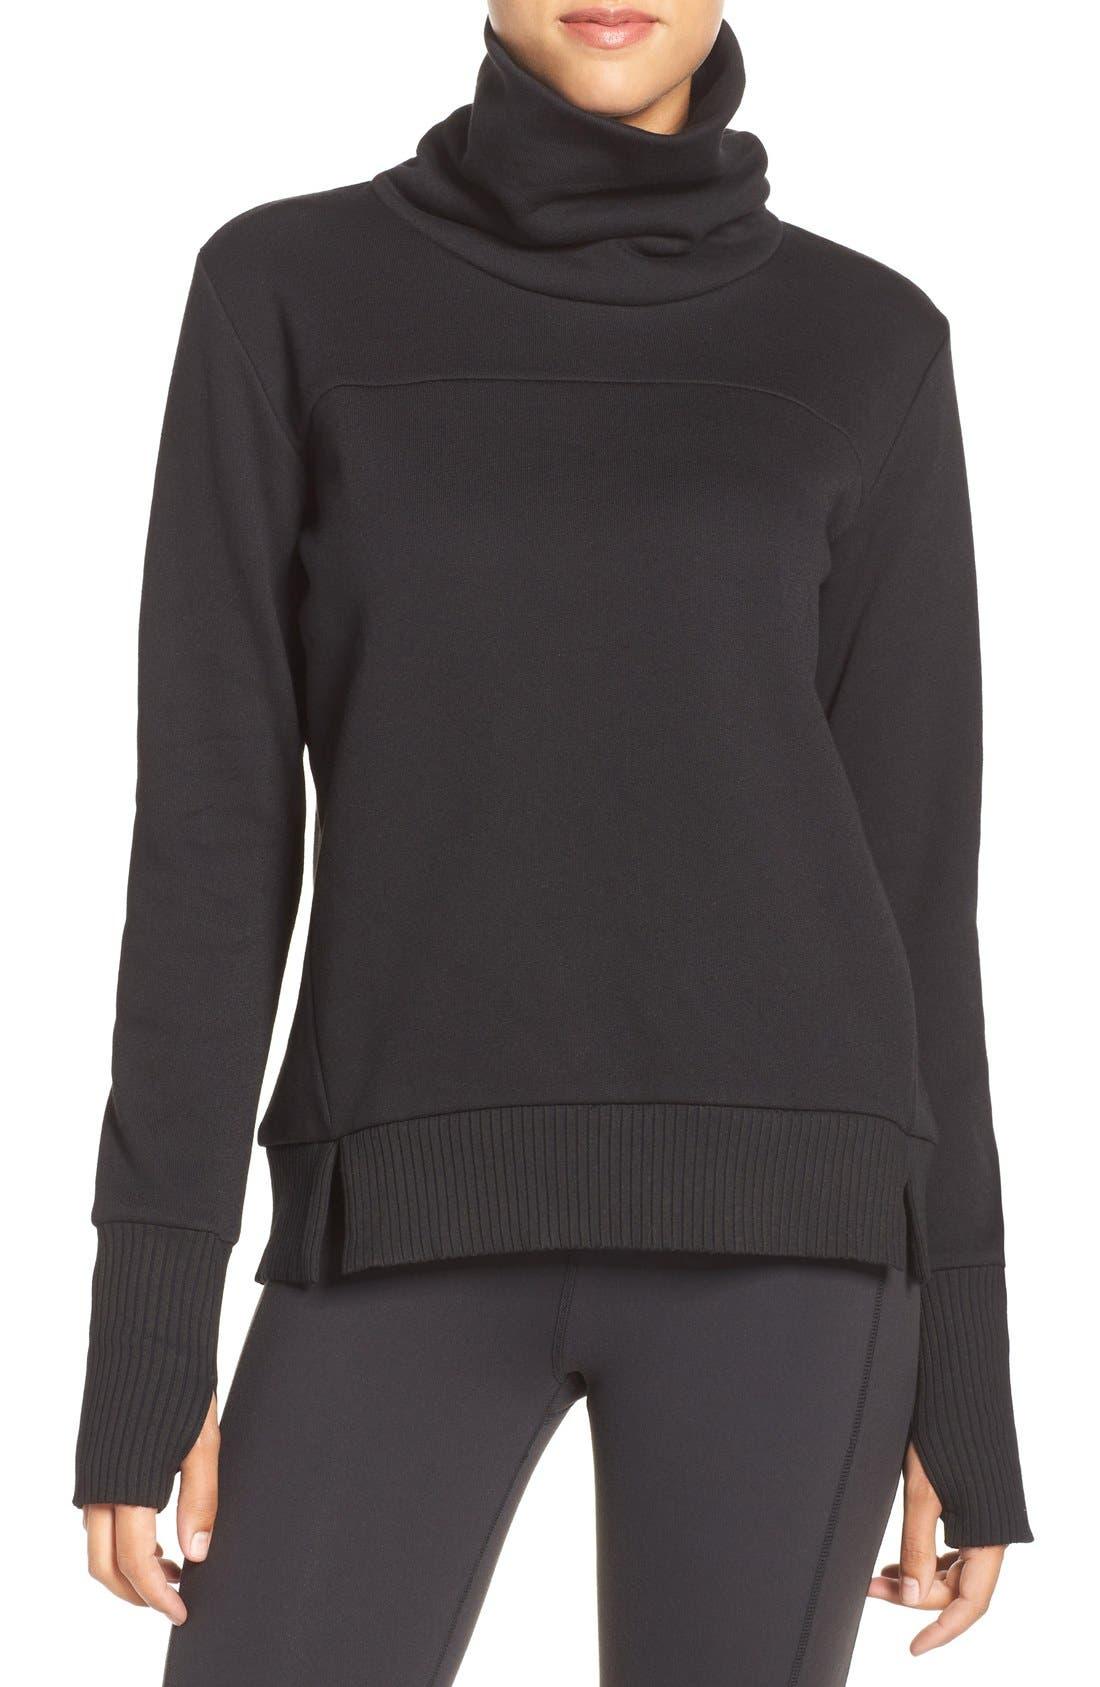 Main Image - Alo 'Haze' Funnel Neck Sweatshirt